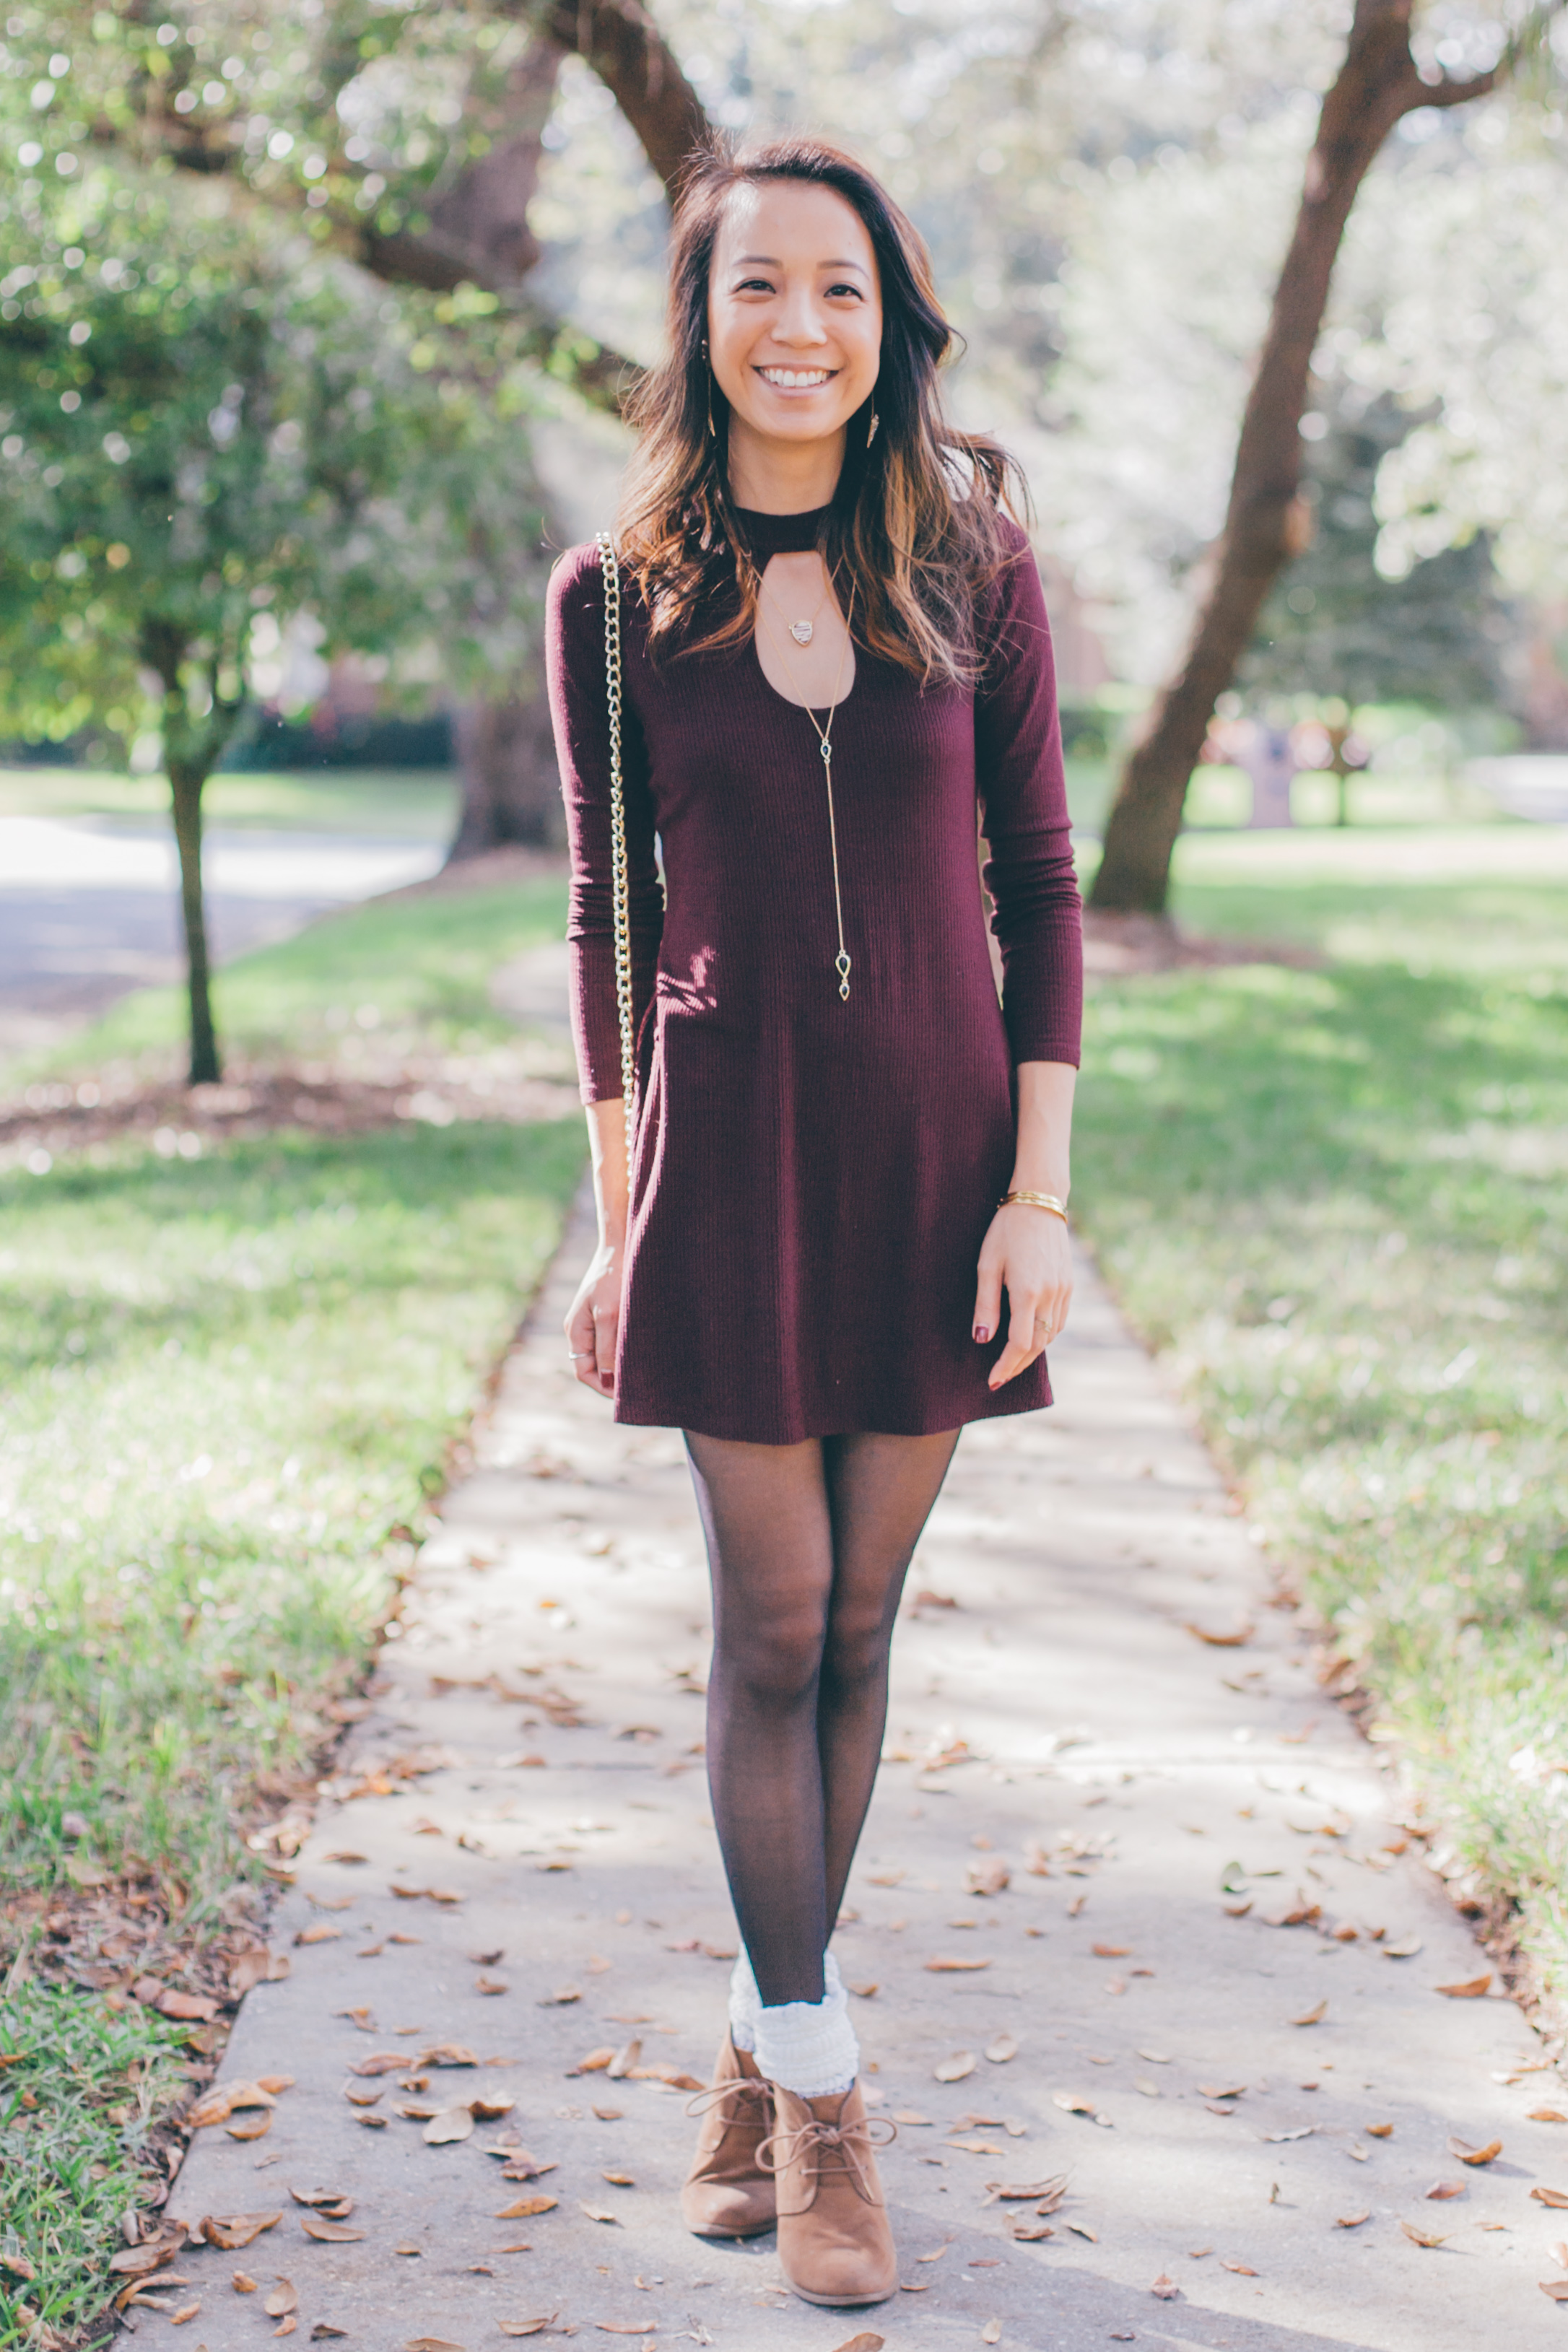 This Jenn Girl - Keyhole Dress 1